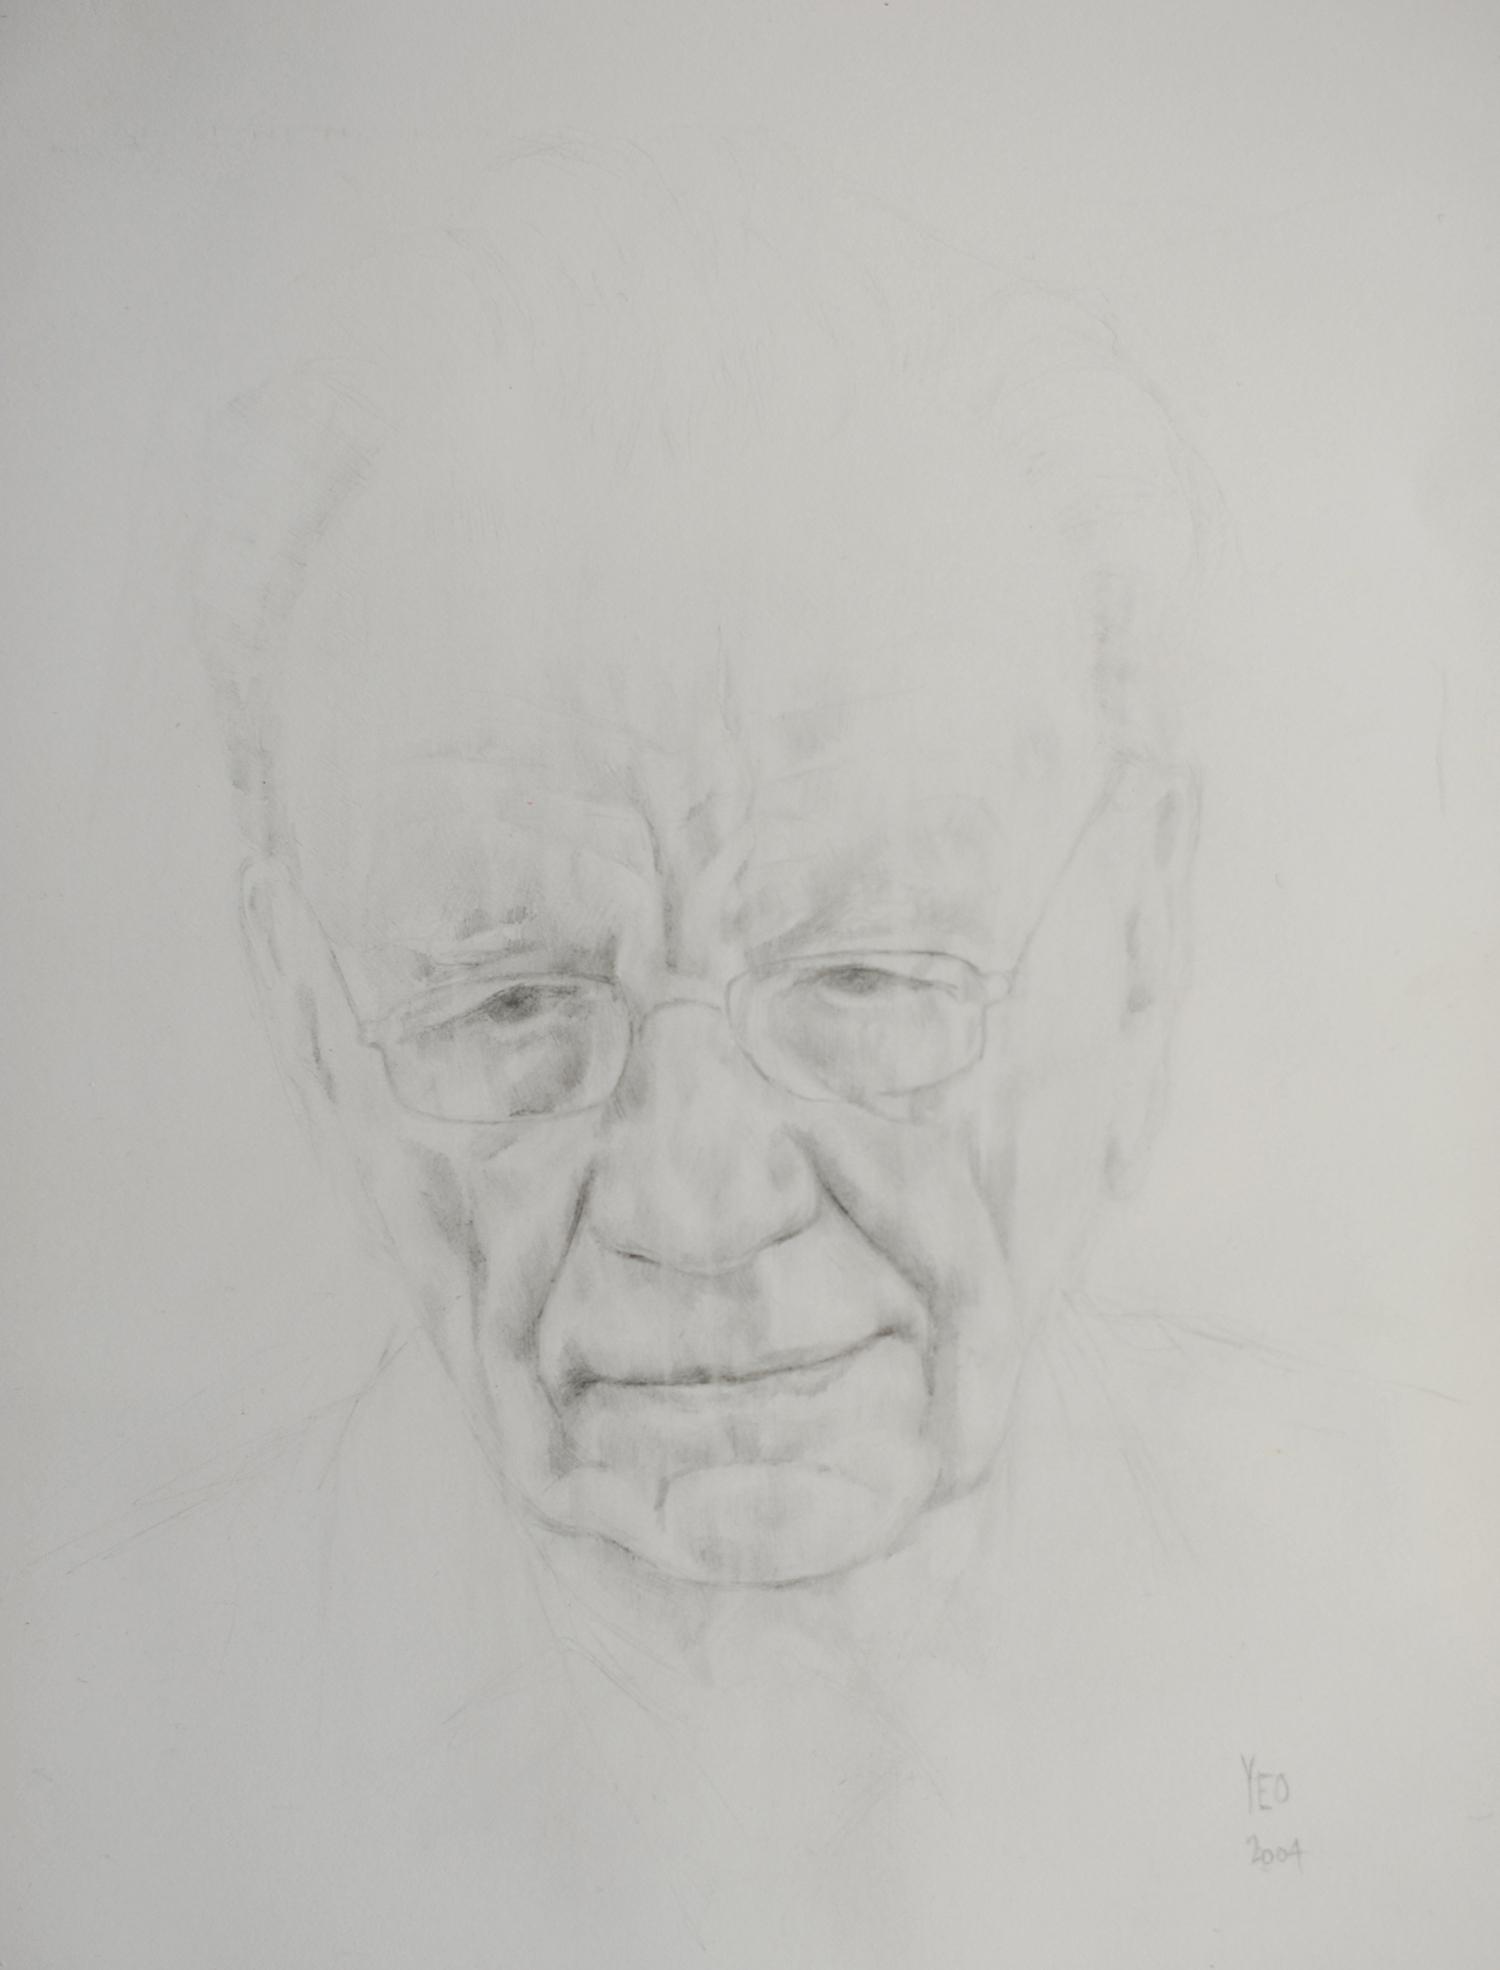 Rupert Murdoch Portrait drawing.jpg